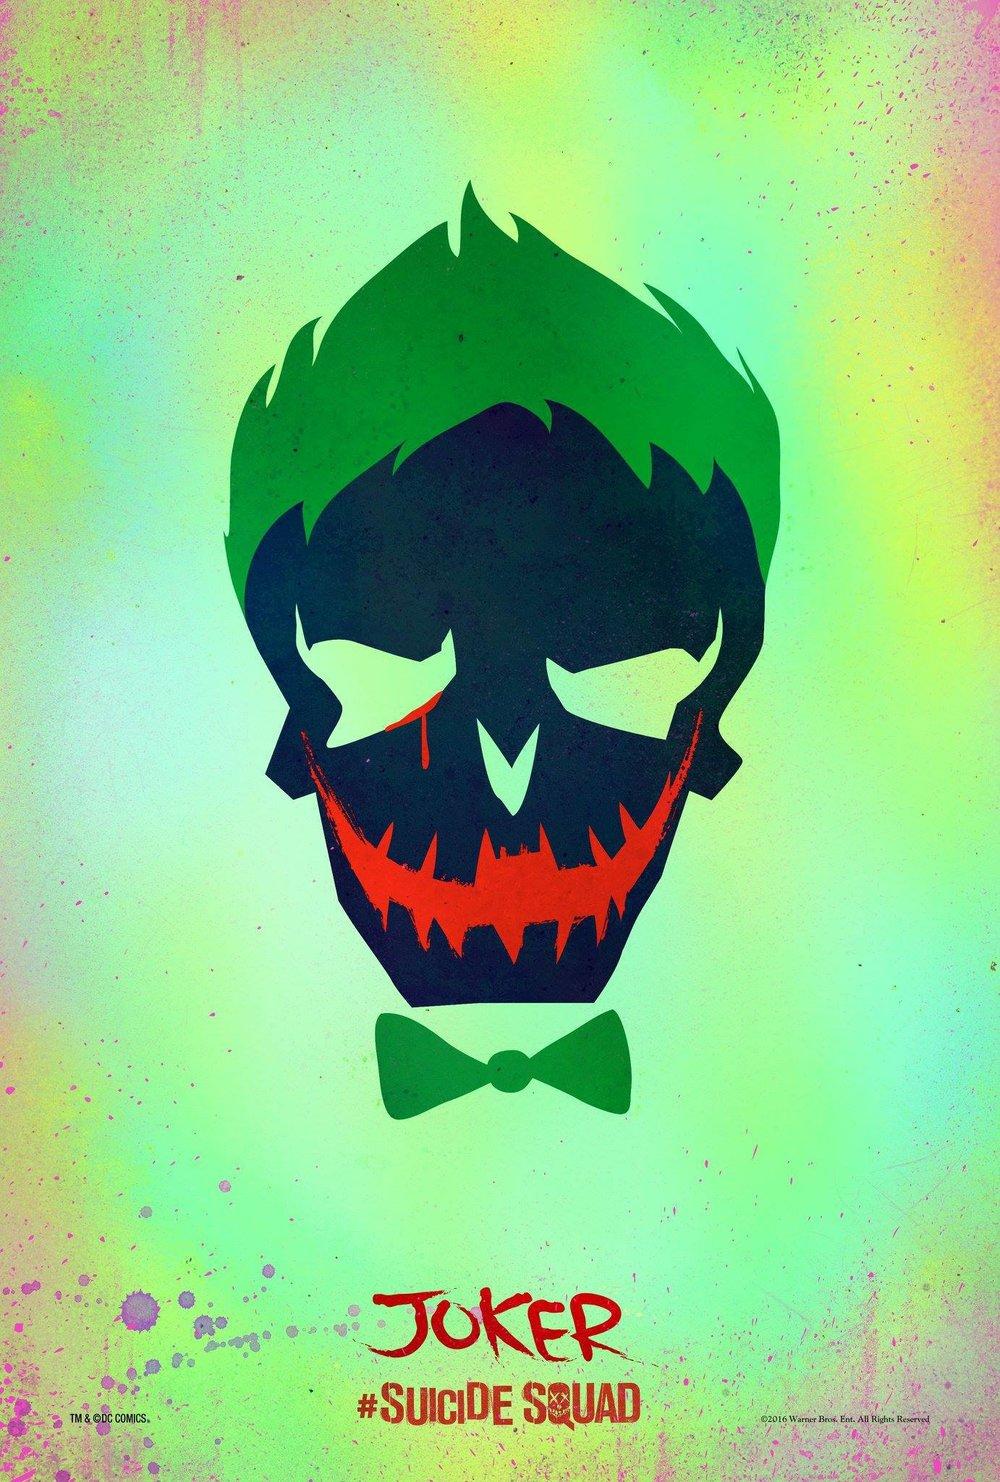 Suicide-Squad-Joker-character-poster.jpg